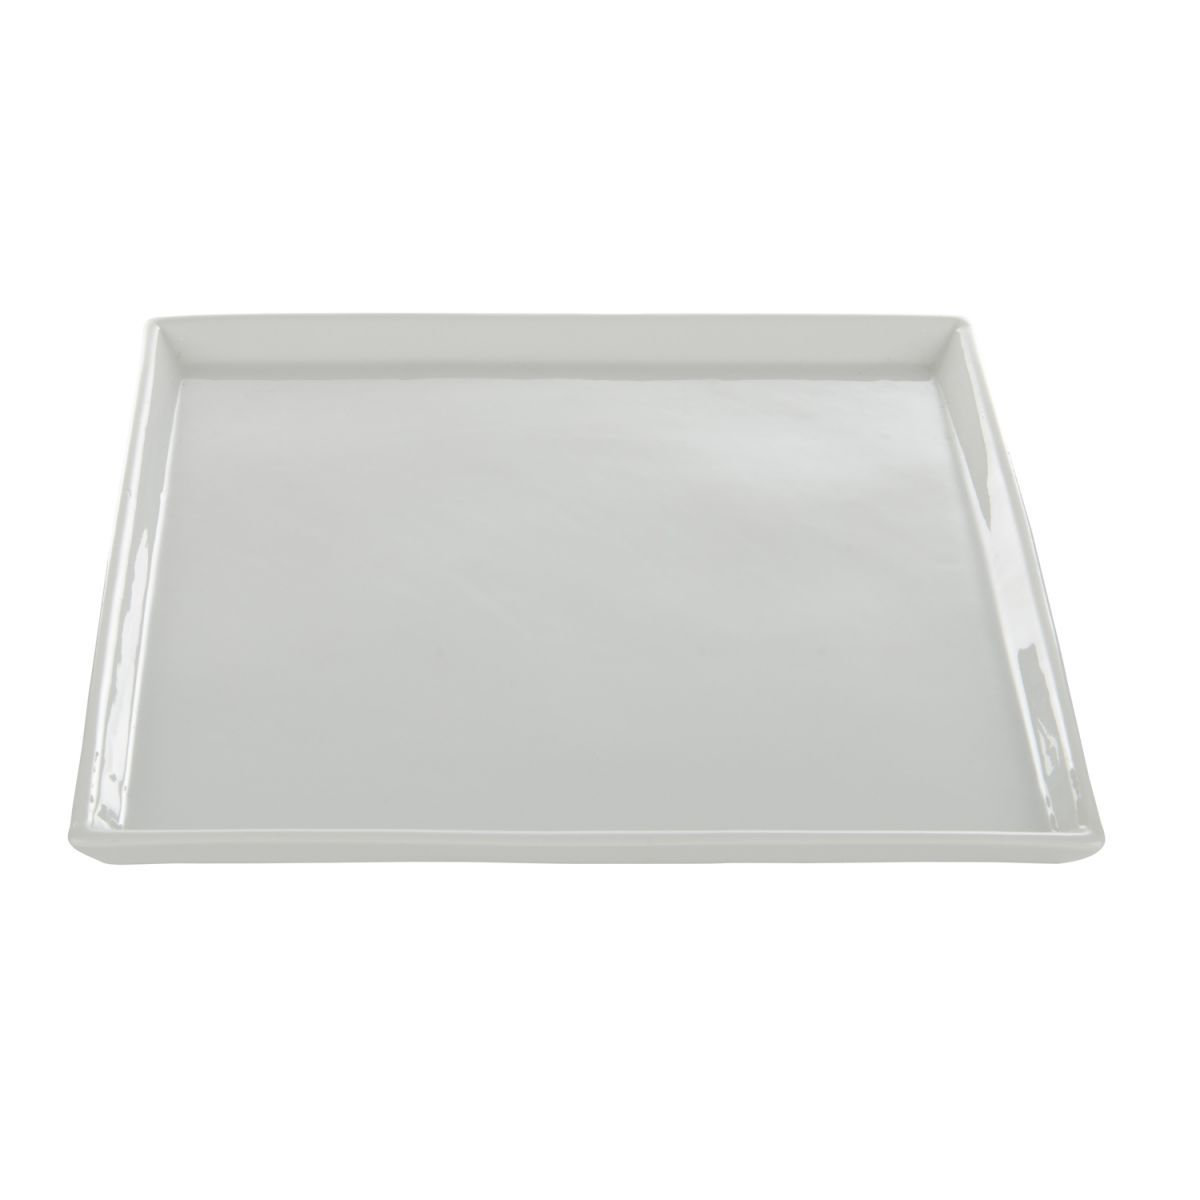 bord vierkant met rand recht 20x20cmbox 6